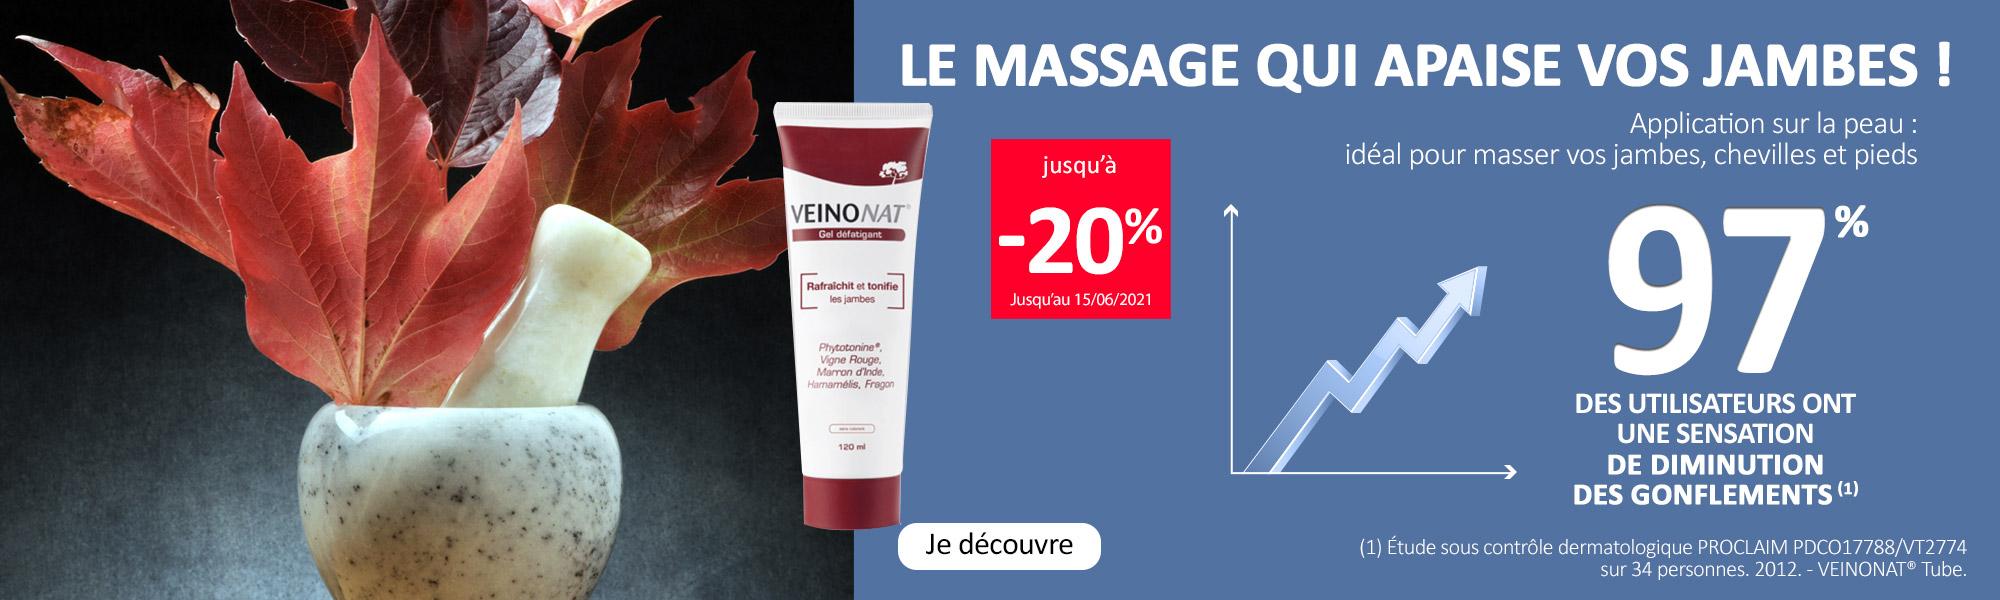 Le massage qui apaise vos jambes